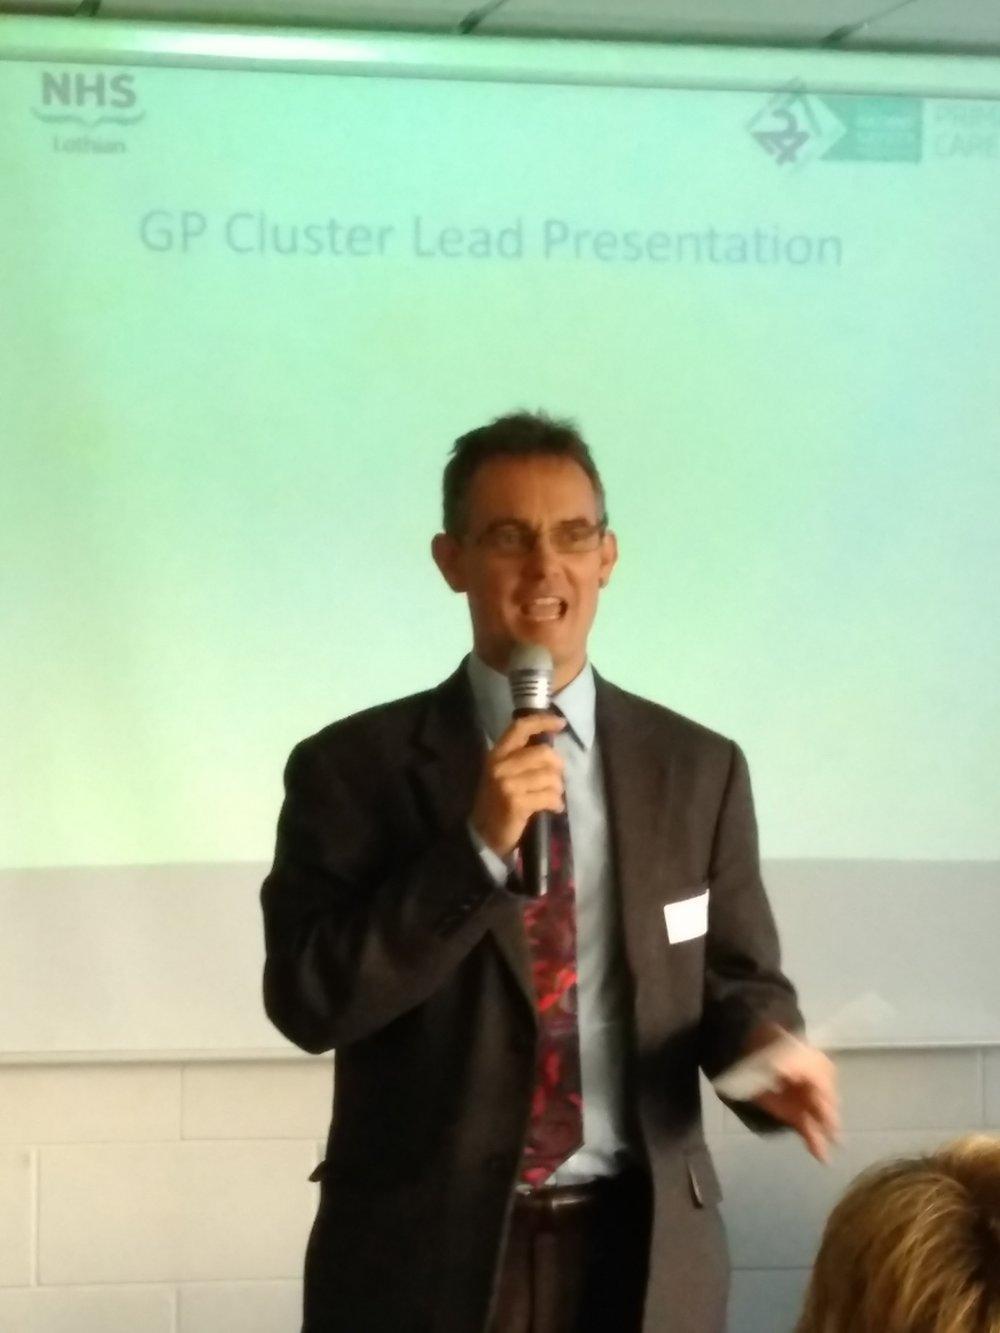 DR ANDREW MACKAY - eDINBURGH CLUSTER QUALITY LEAD